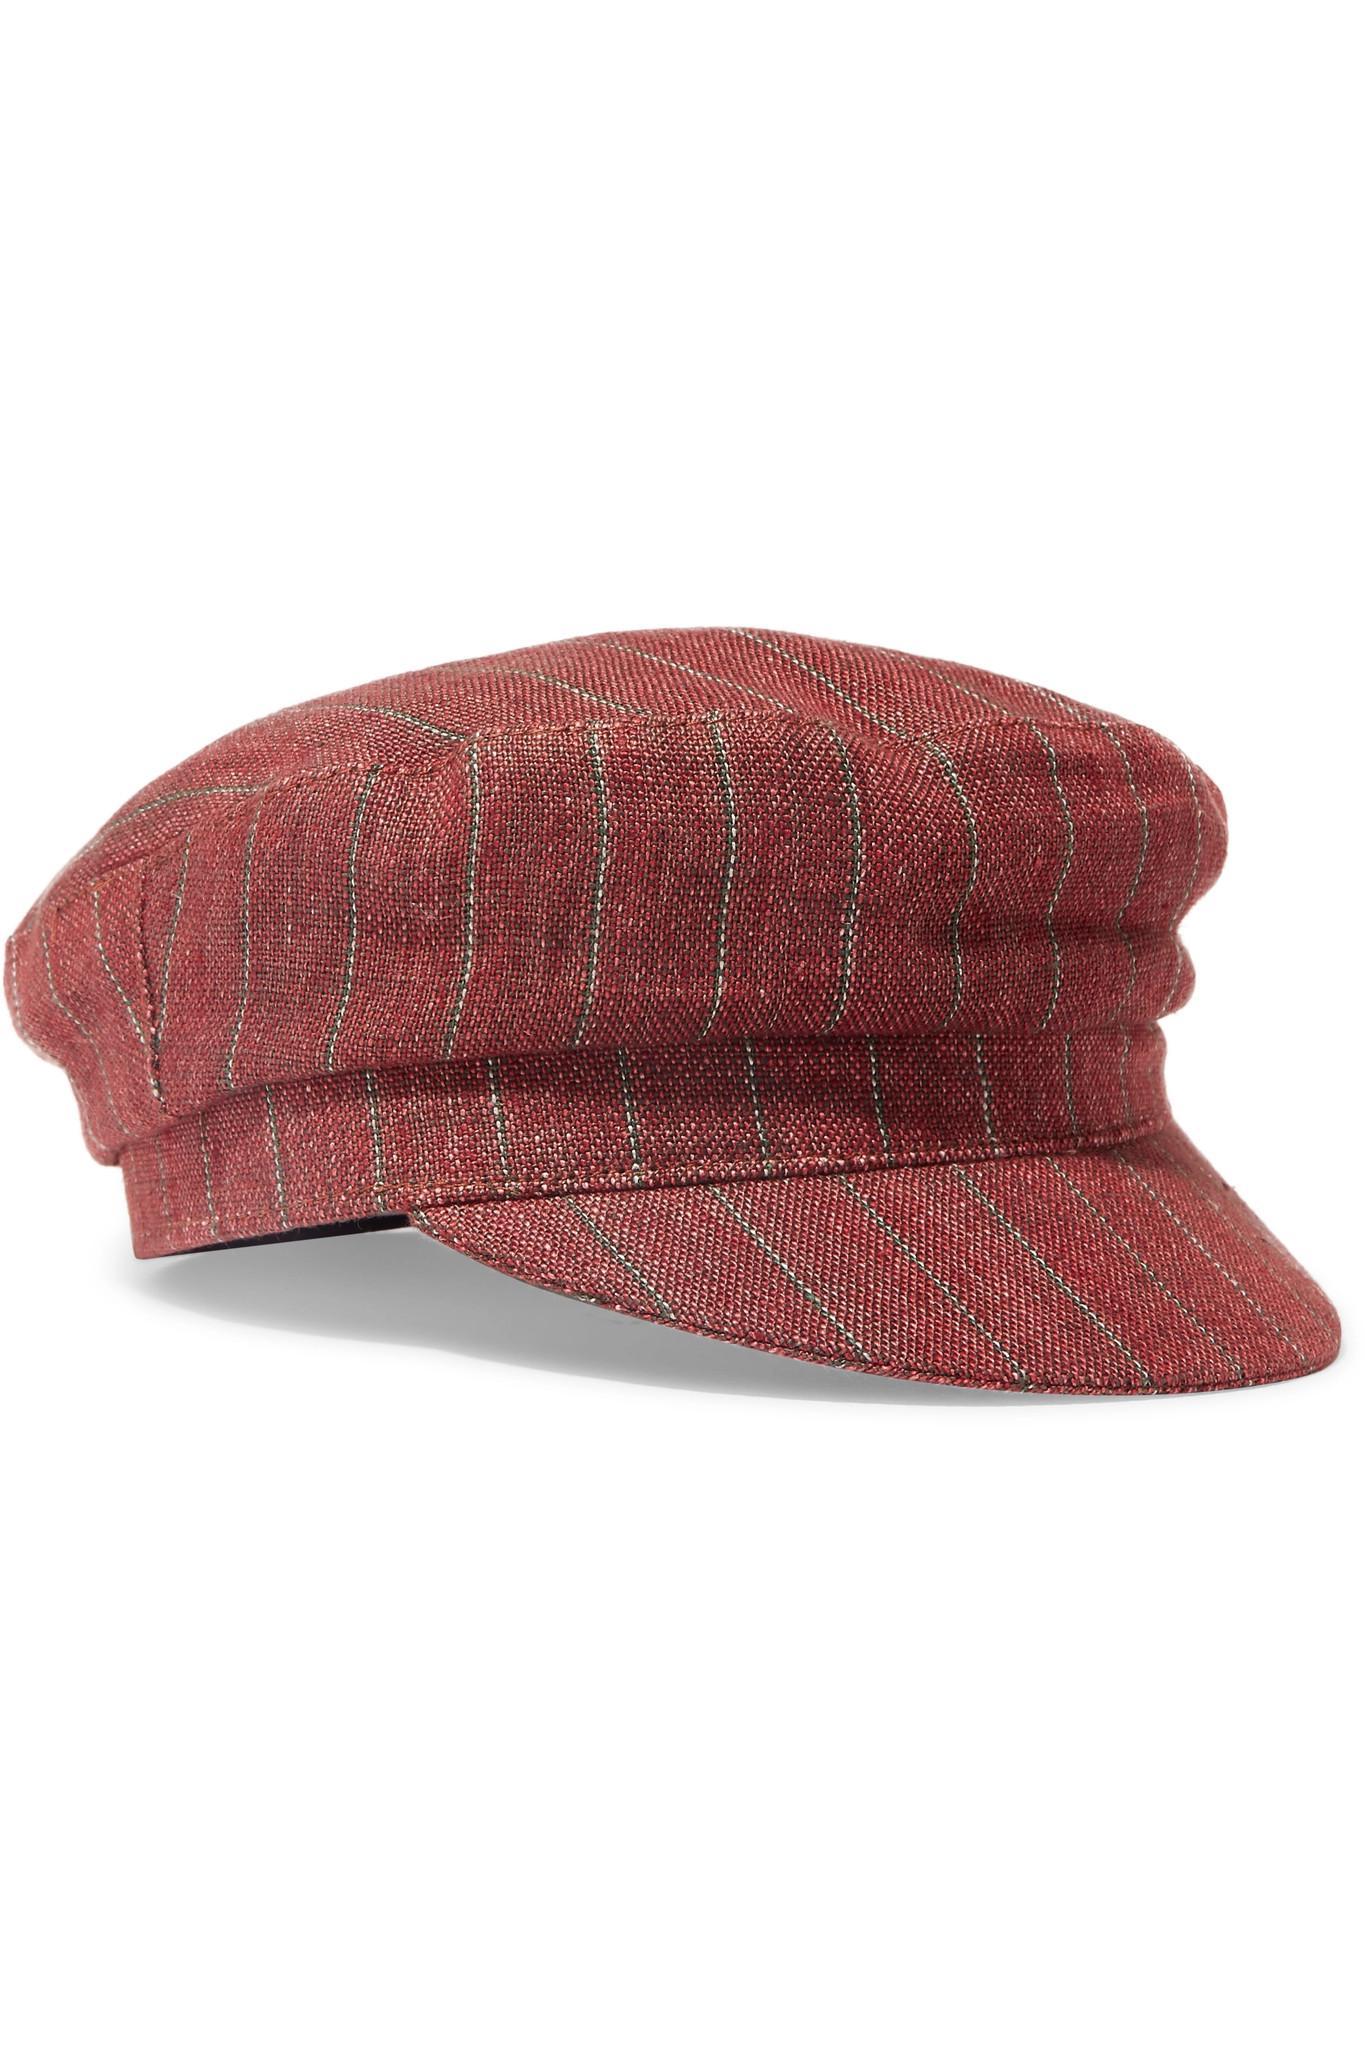 ca598596179 Lyst - Isabel Marant Evie Striped Linen Cap in Orange